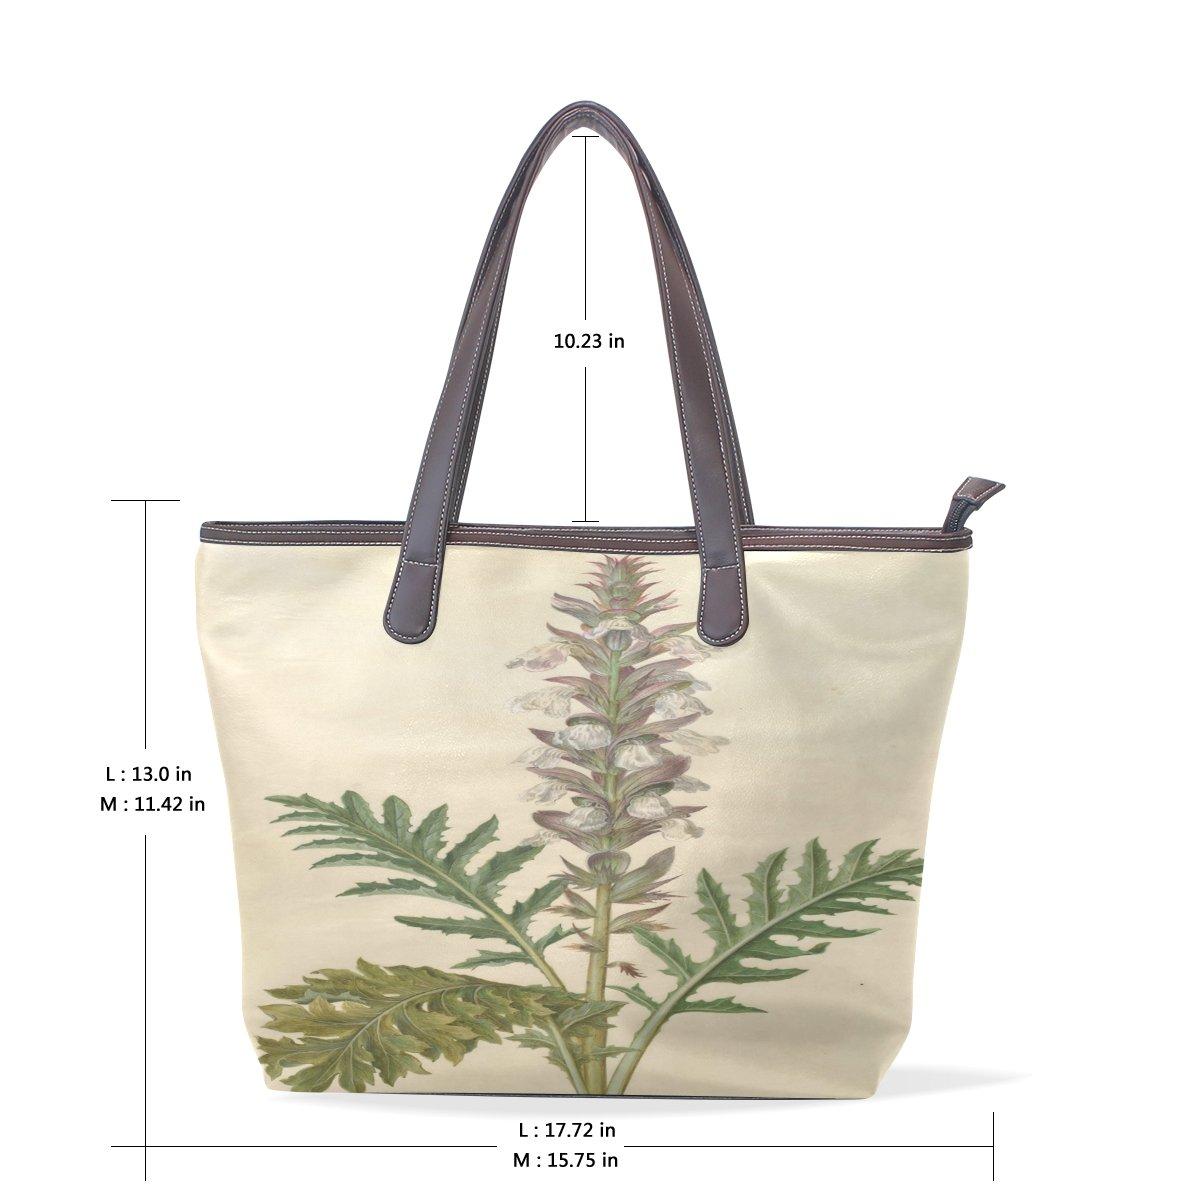 Ye Store Graceful Flowers Lady PU Leather Handbag Tote Bag Shoulder Bag Shopping Bag